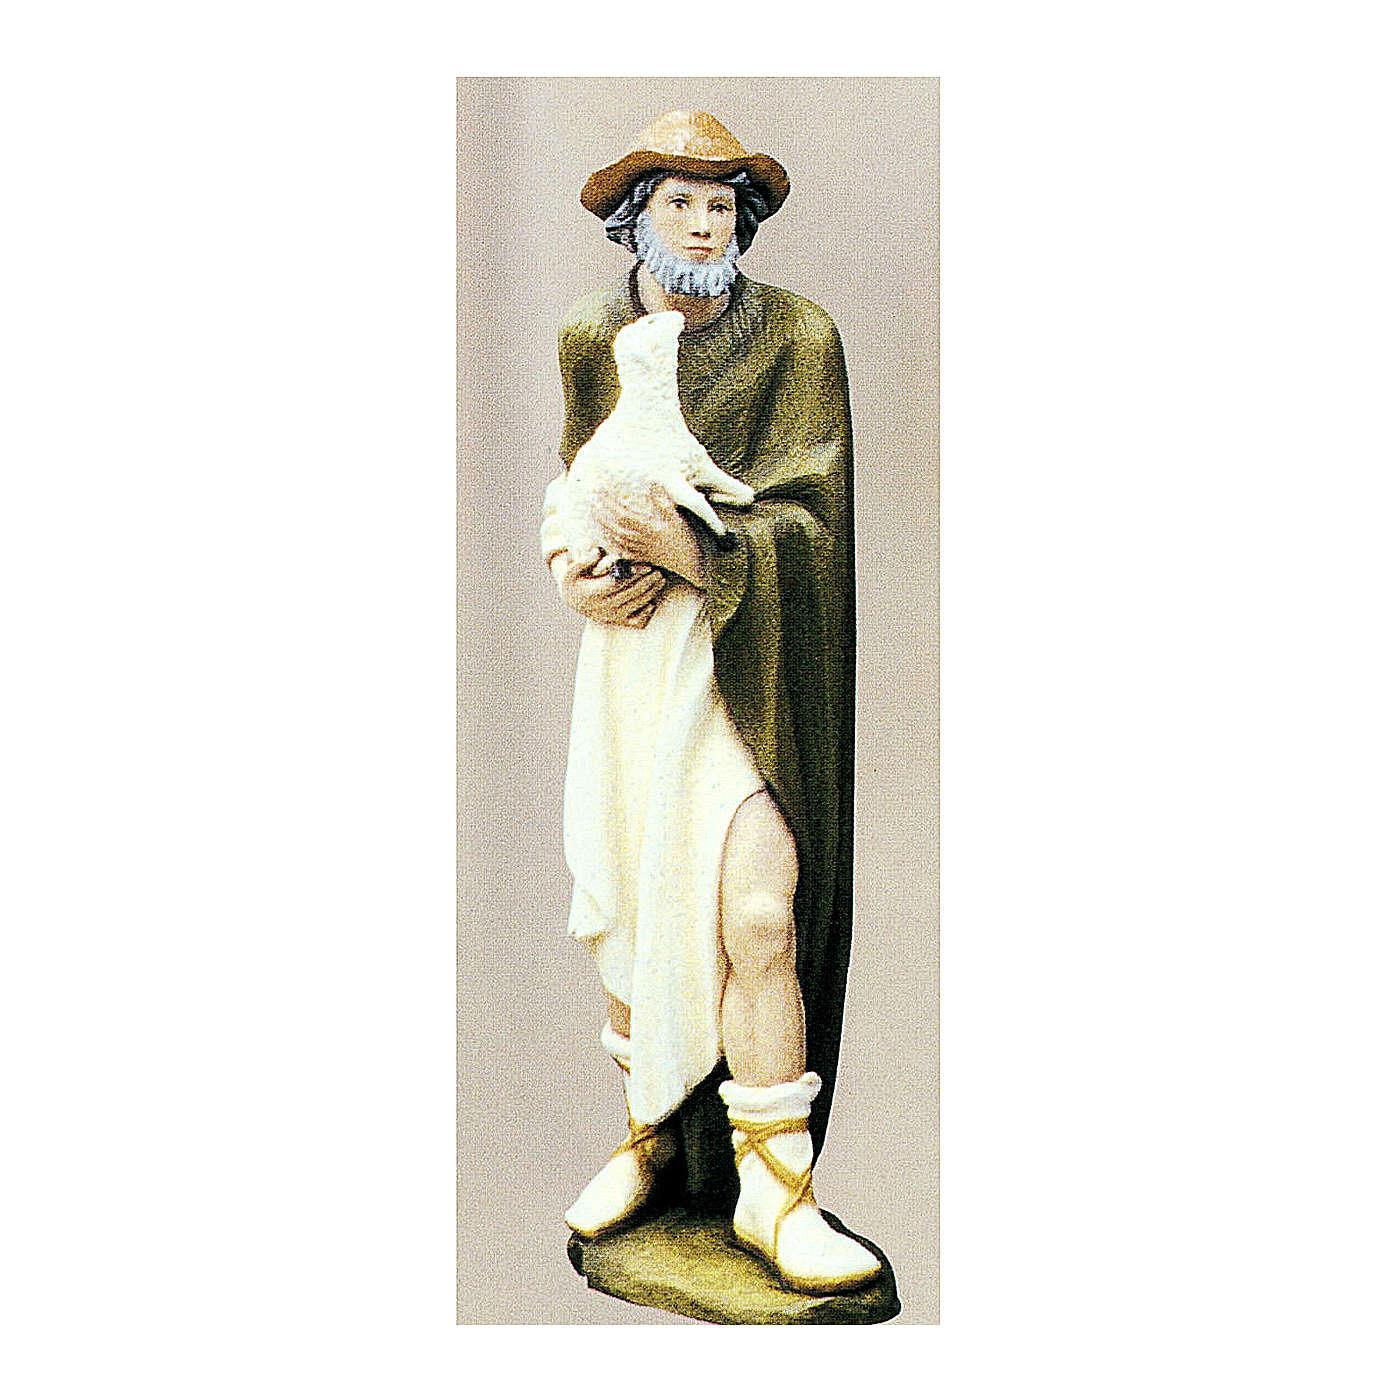 Shepherd with Small Sheep 80 cm Nativity Statue in Painted Fiberglass 4